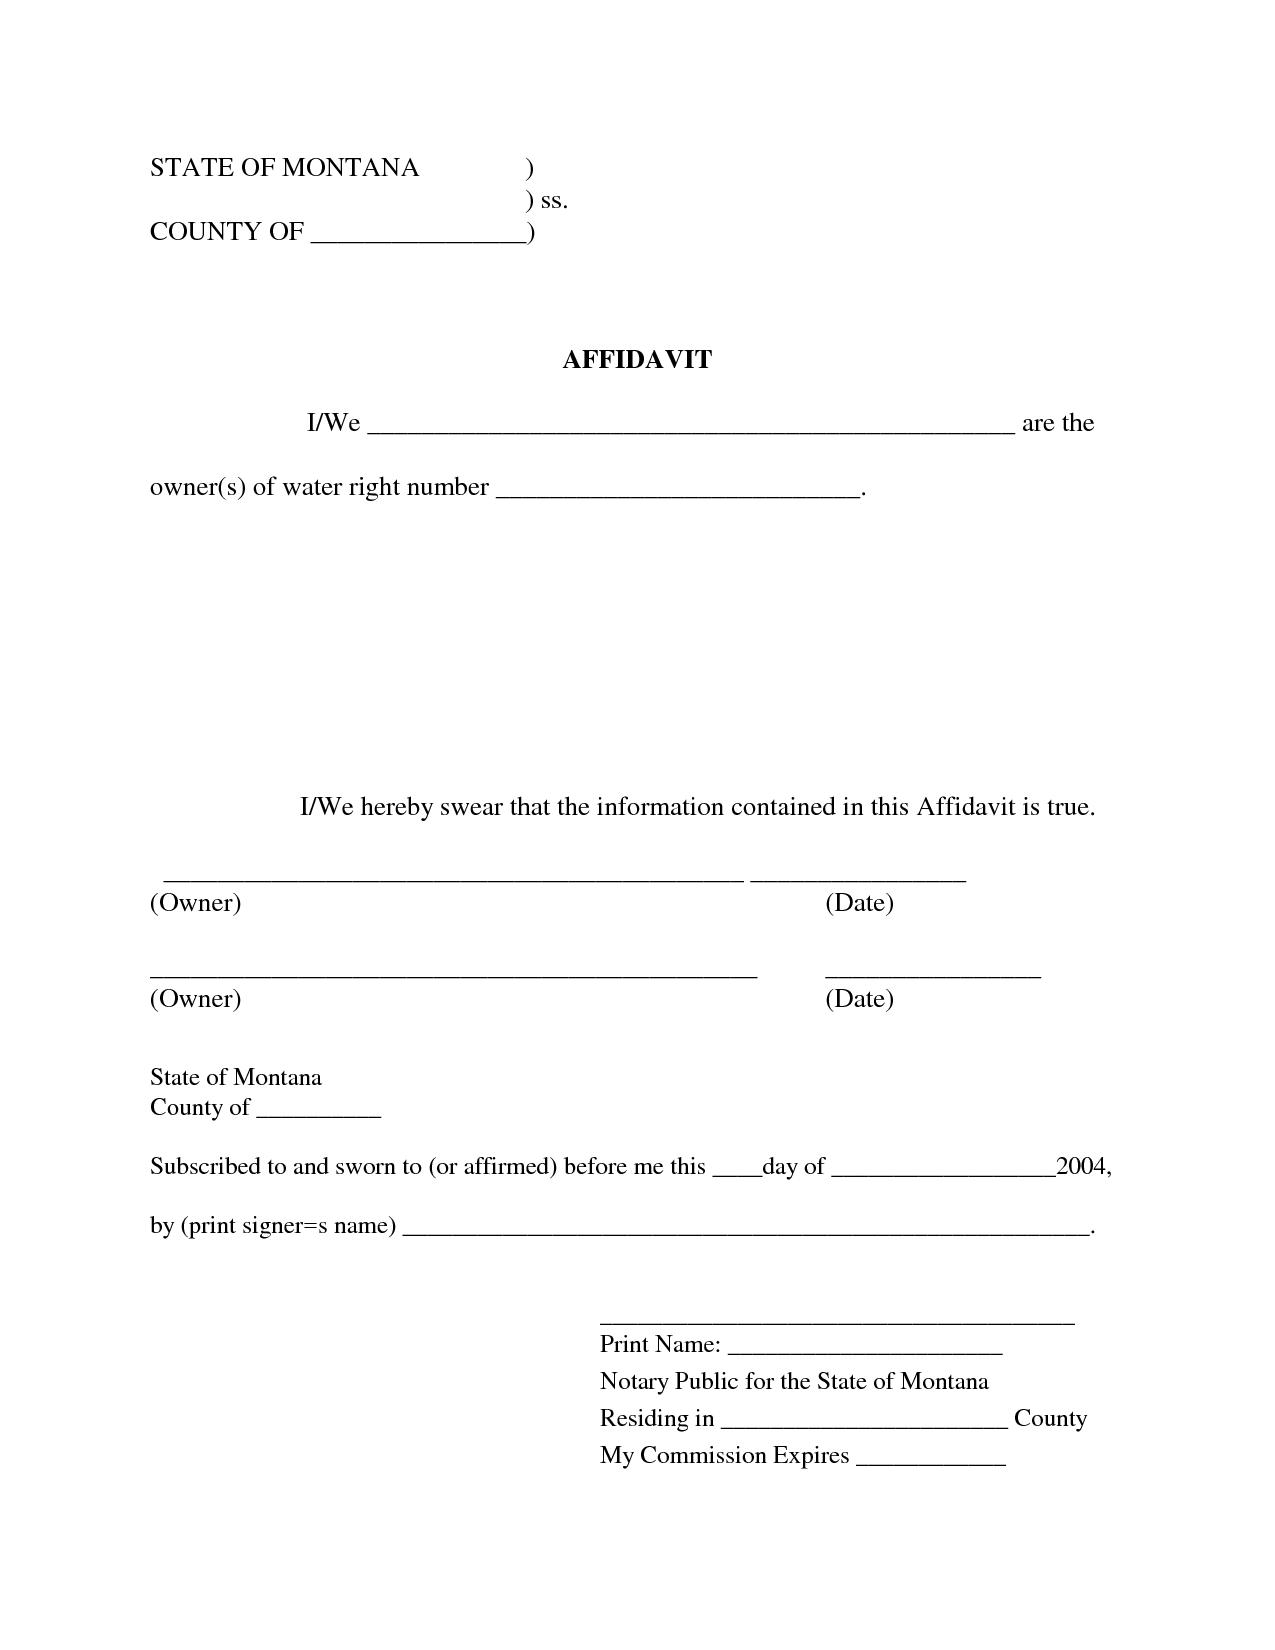 Affidavit Template Free